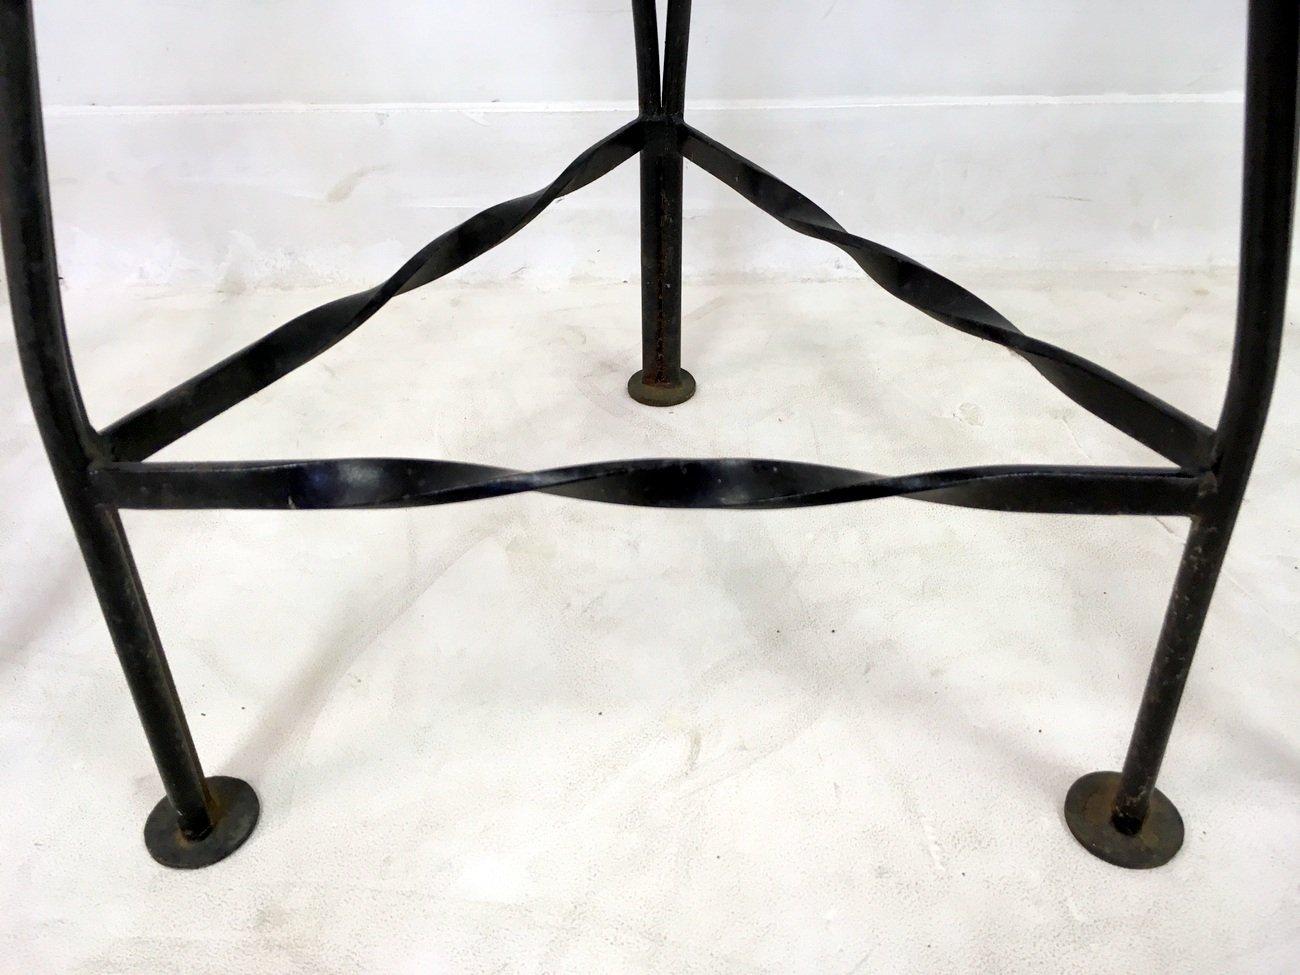 Italian Vintage Iron Bar Stools 1970s Set Of 3 For Sale